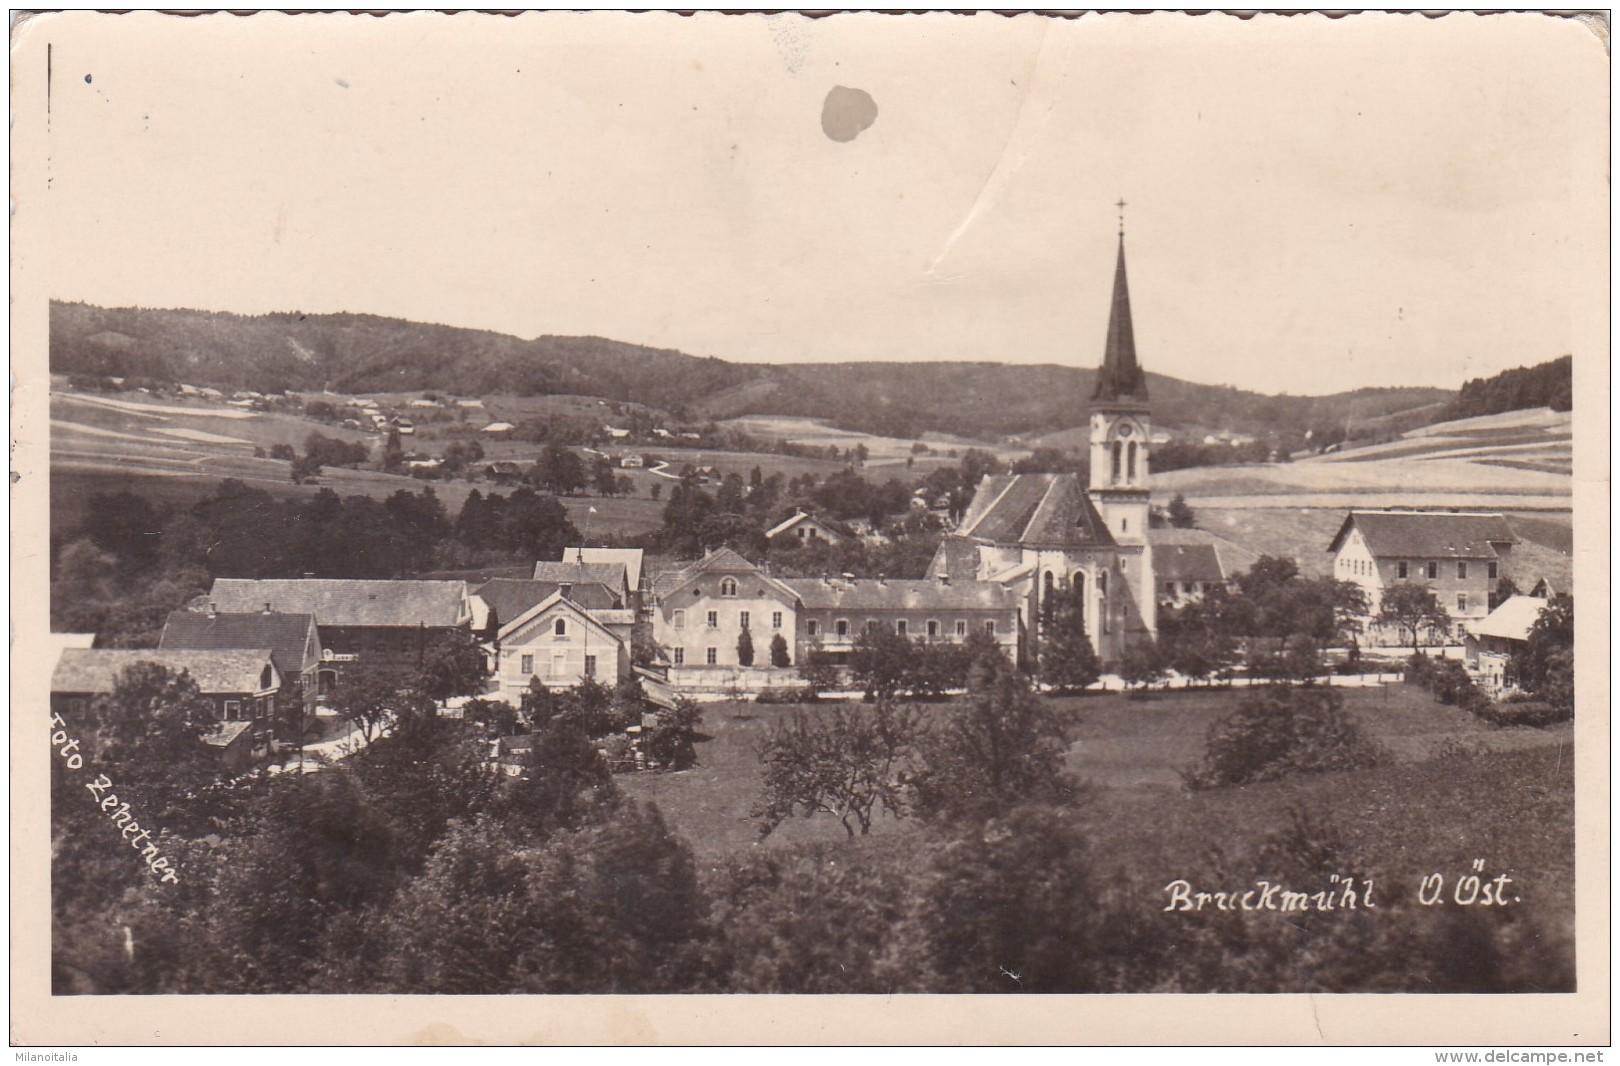 Bruckmühl - Ottnang A. Hausruck * Feldpost 13. 12. 1941 - Österreich